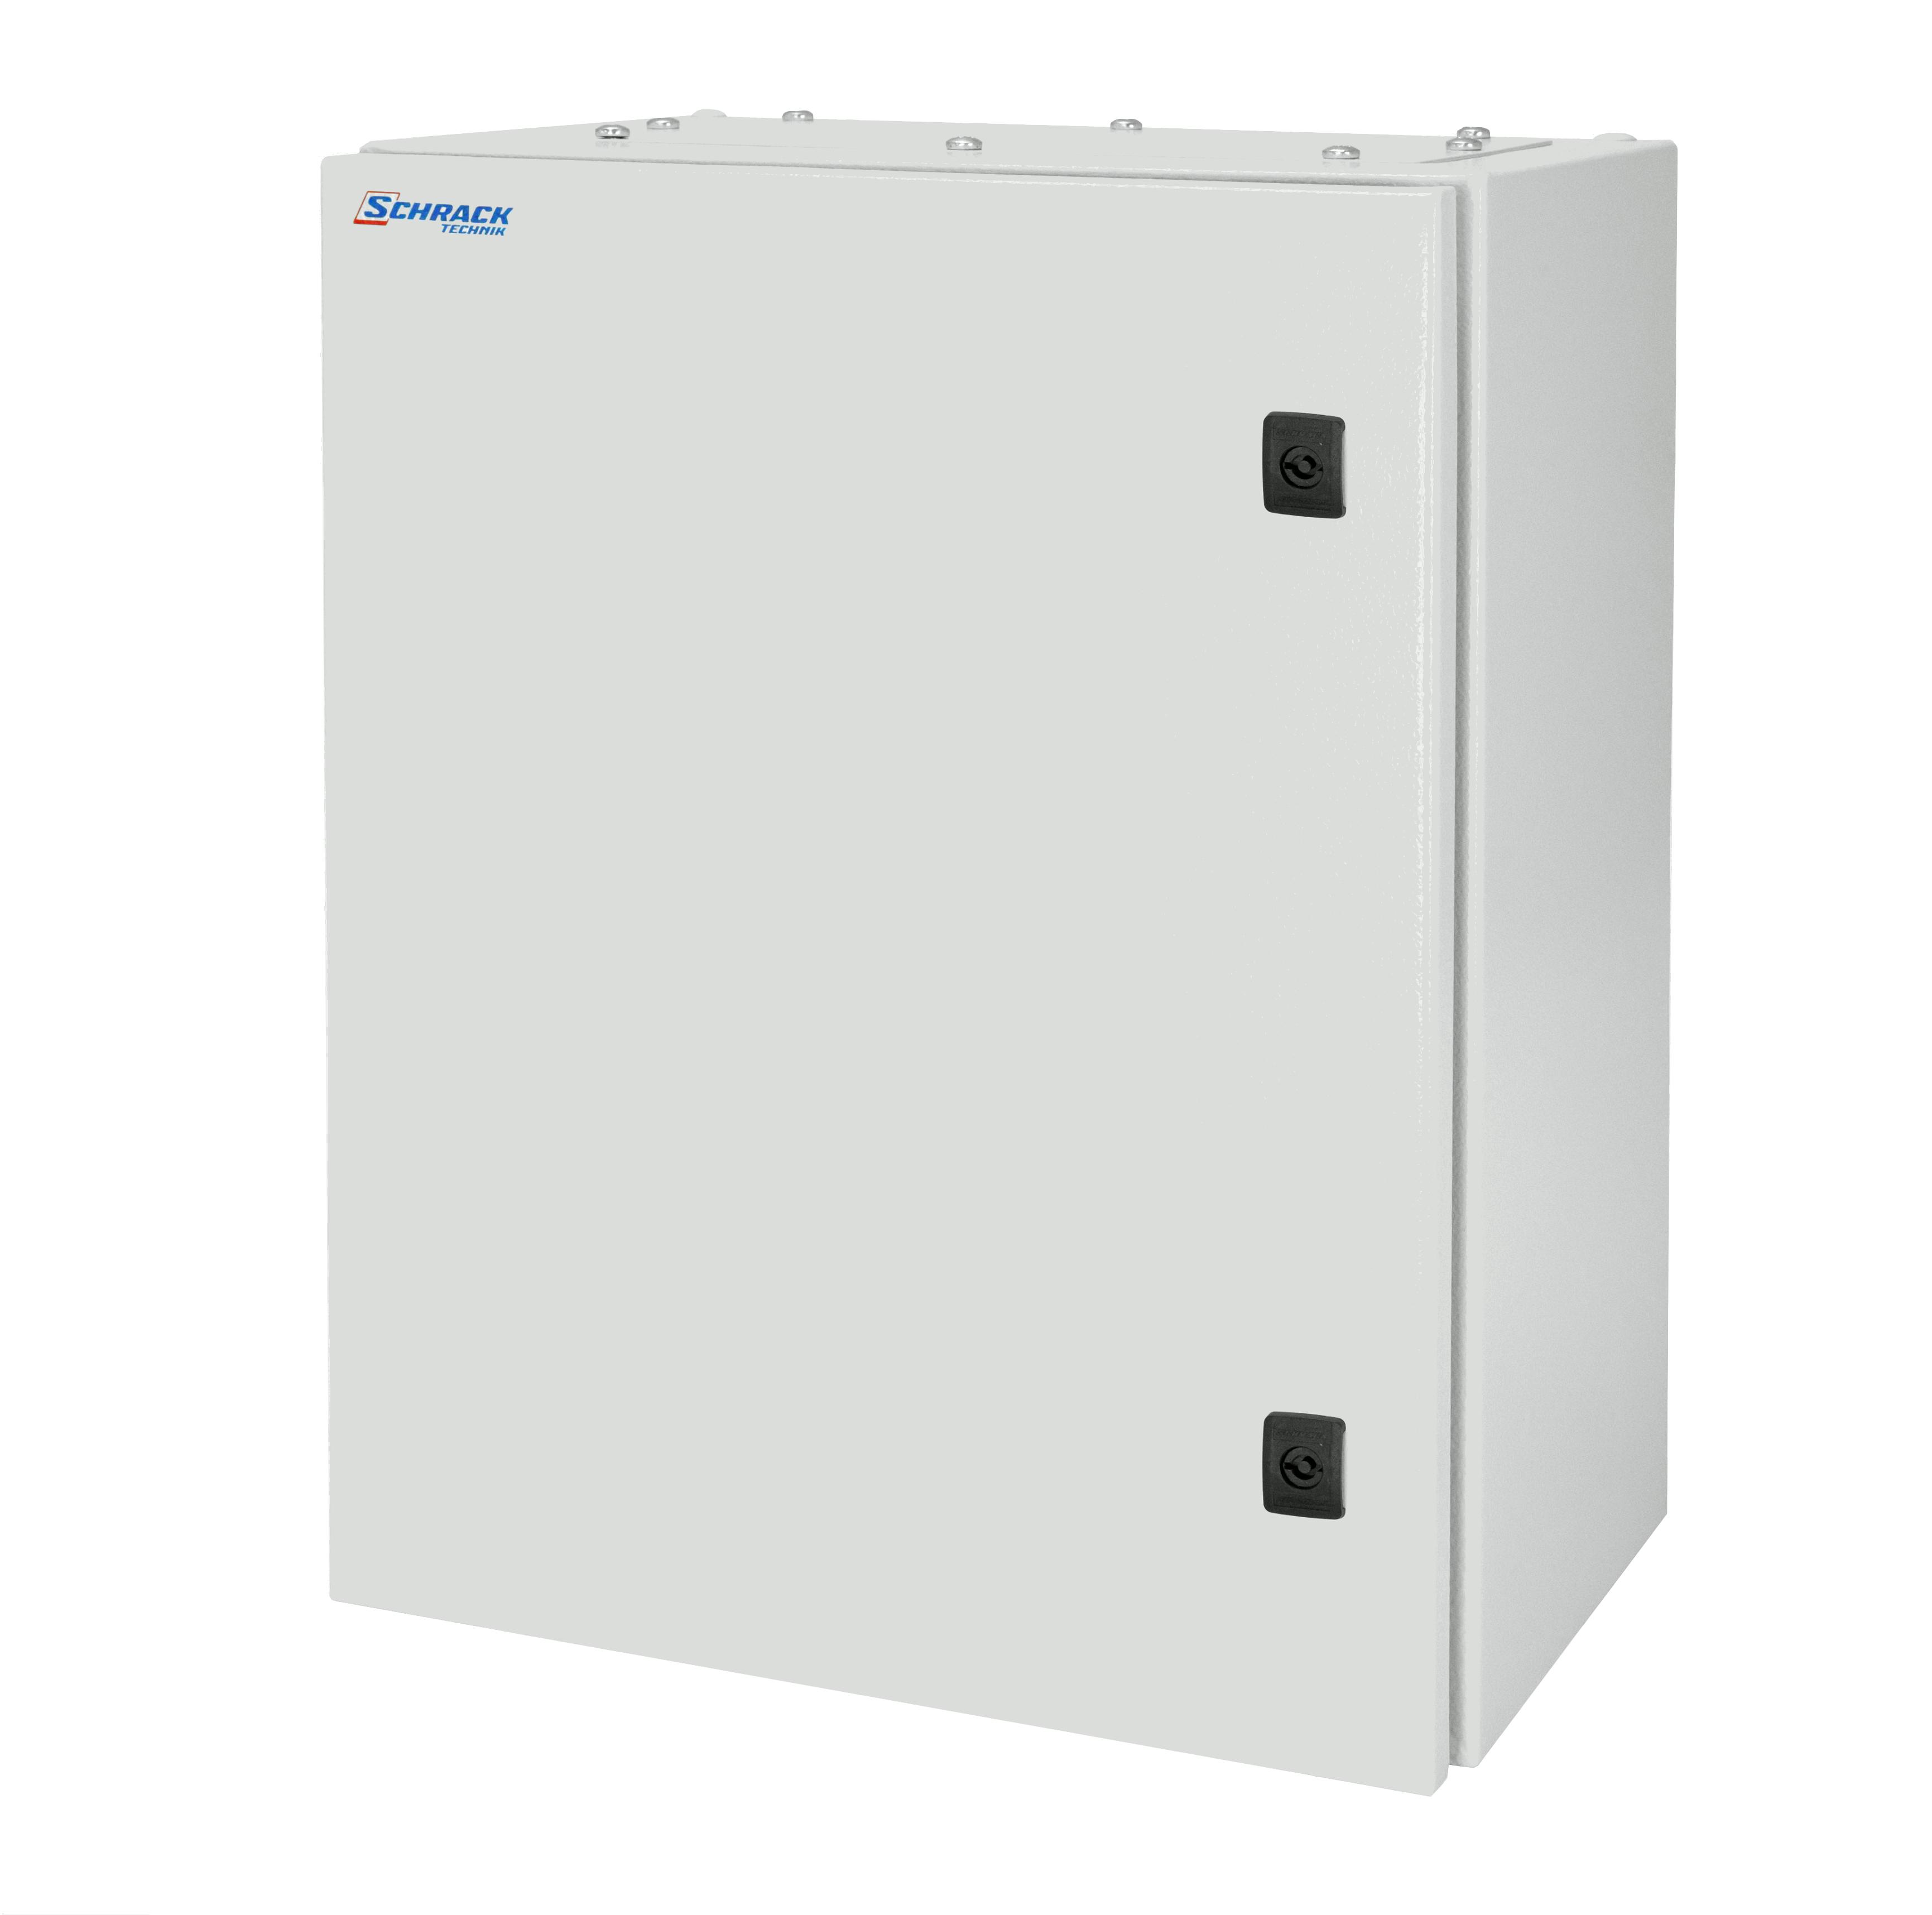 1 Stk Wandschrank Mono IP66 H=800 B=800 T=210 Stahlblech WSM8080210